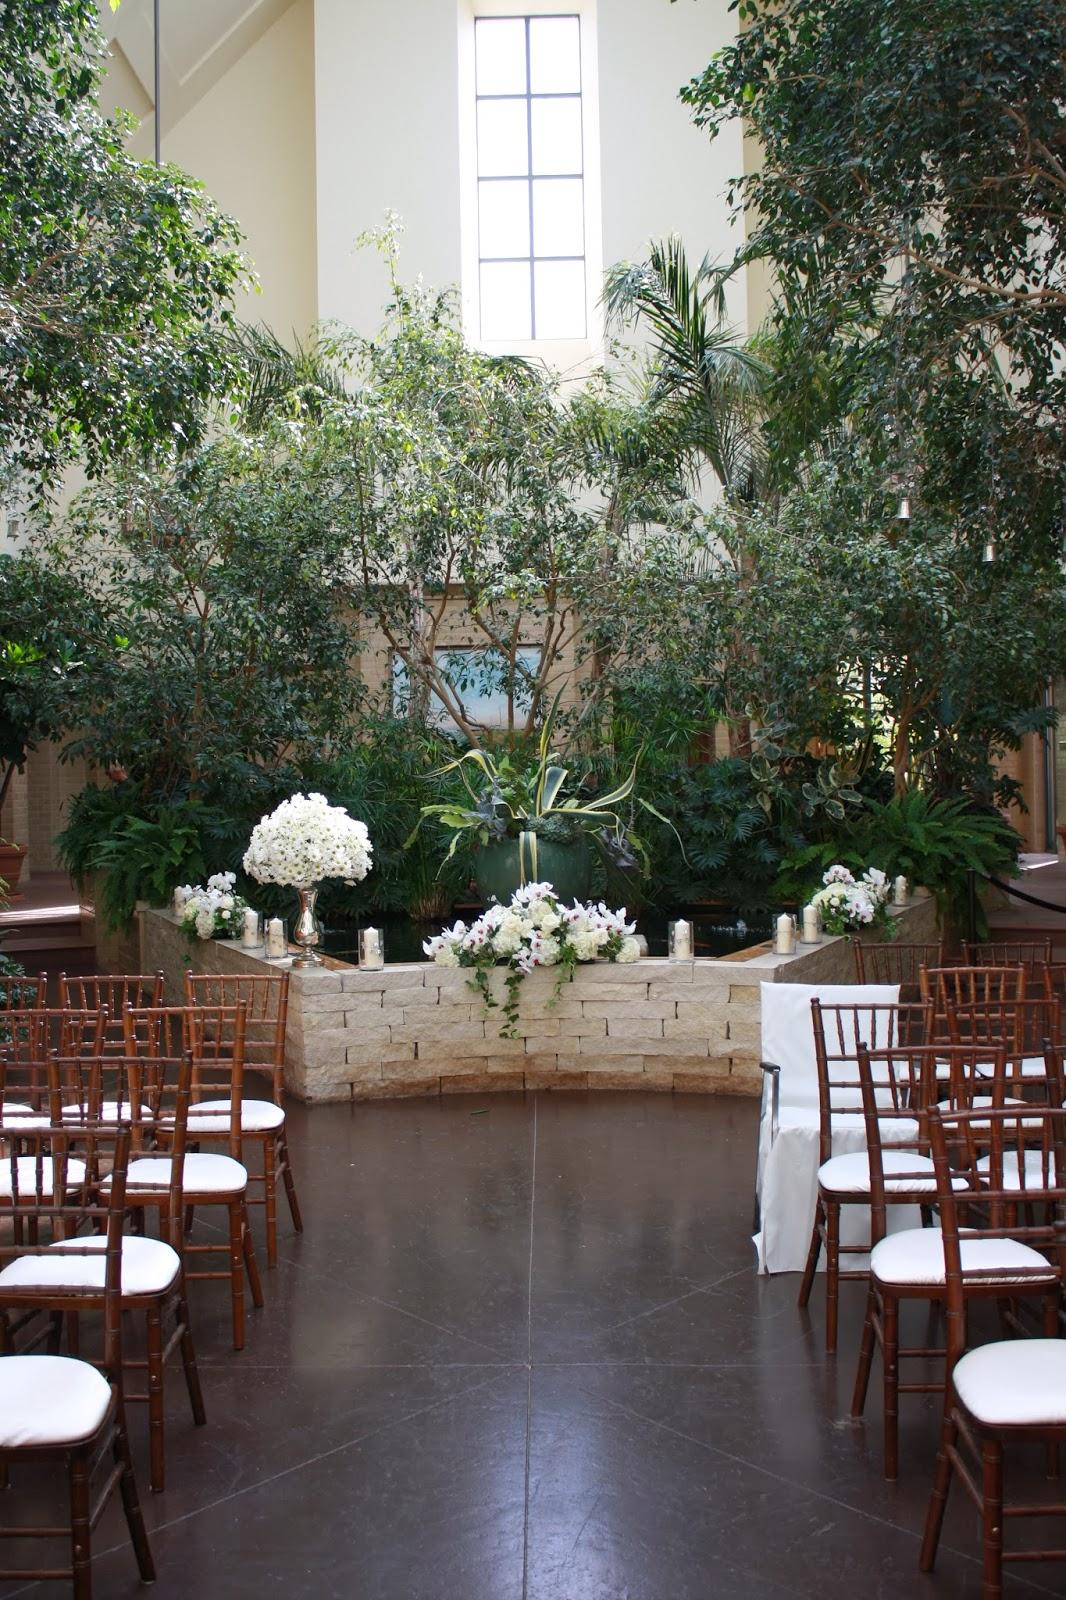 Calyx Glass Blog: Kaneko at Lauritzen Gardens  Lauritzen Gardens Wedding